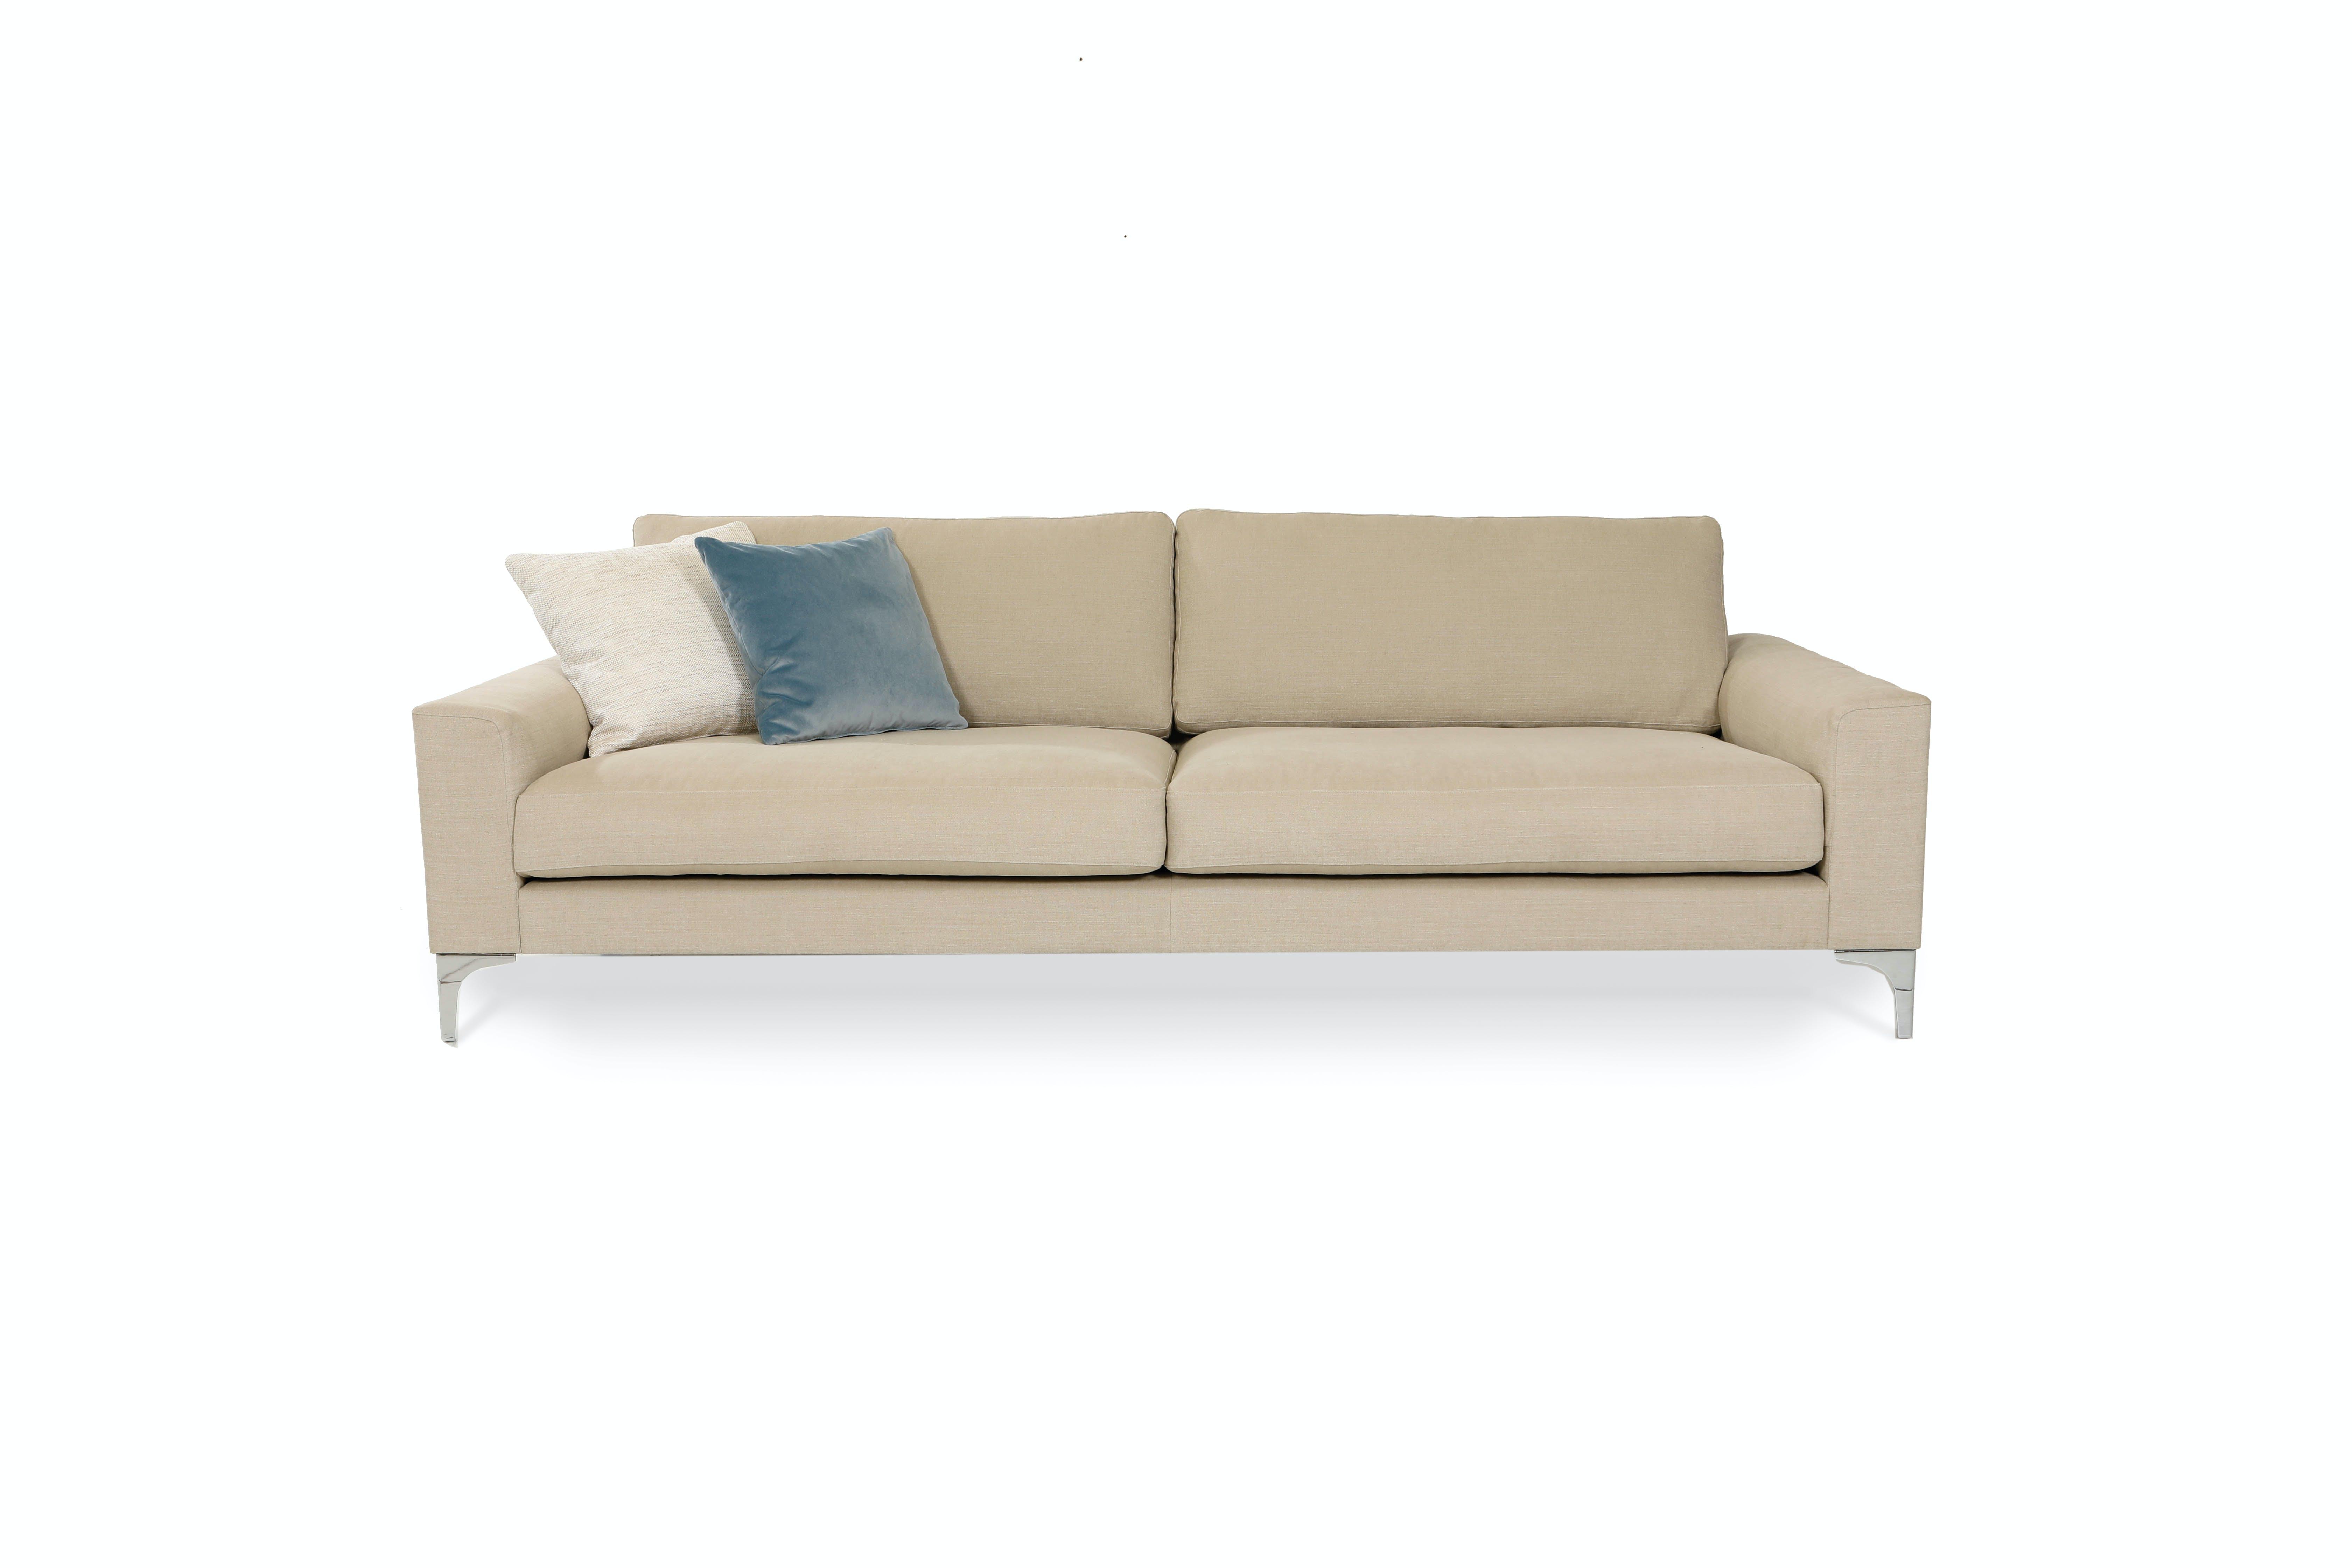 Jab Anstoetz White Jon Edwards Modular Sofa Haute Living